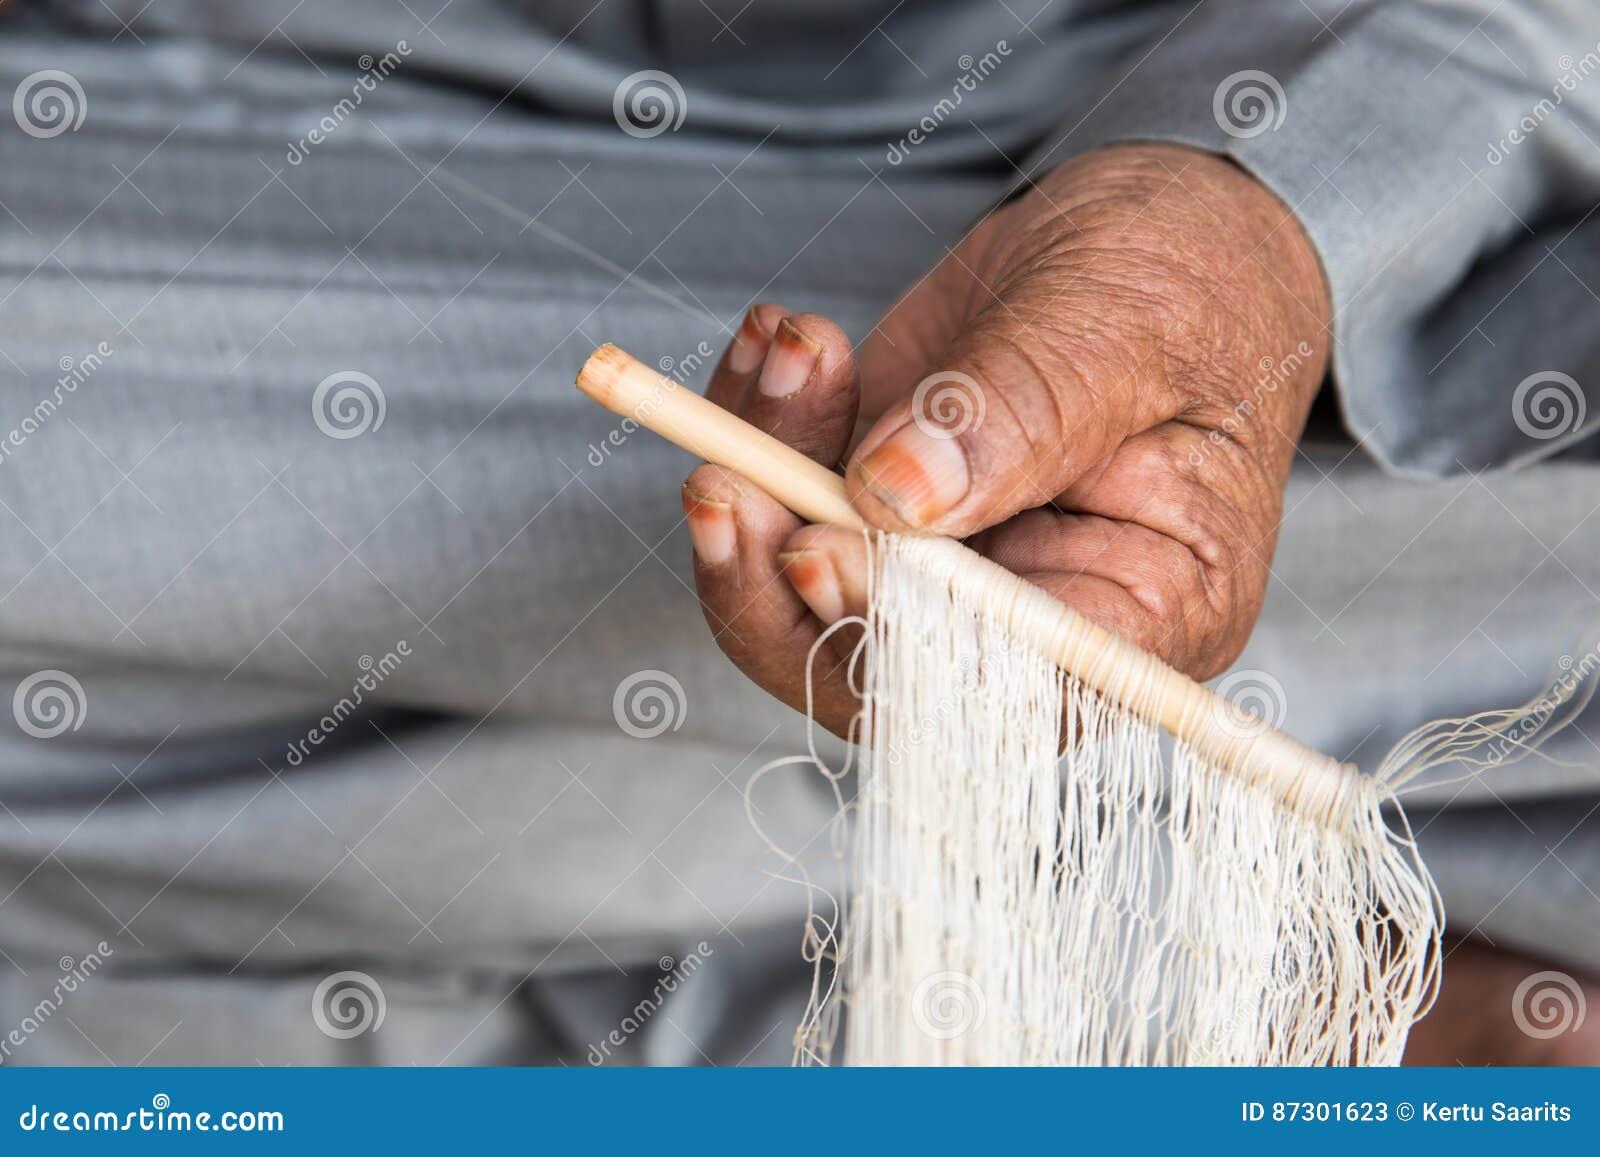 An Omani Man Weaving A Fishing Net  Editorial Stock Photo - Image of